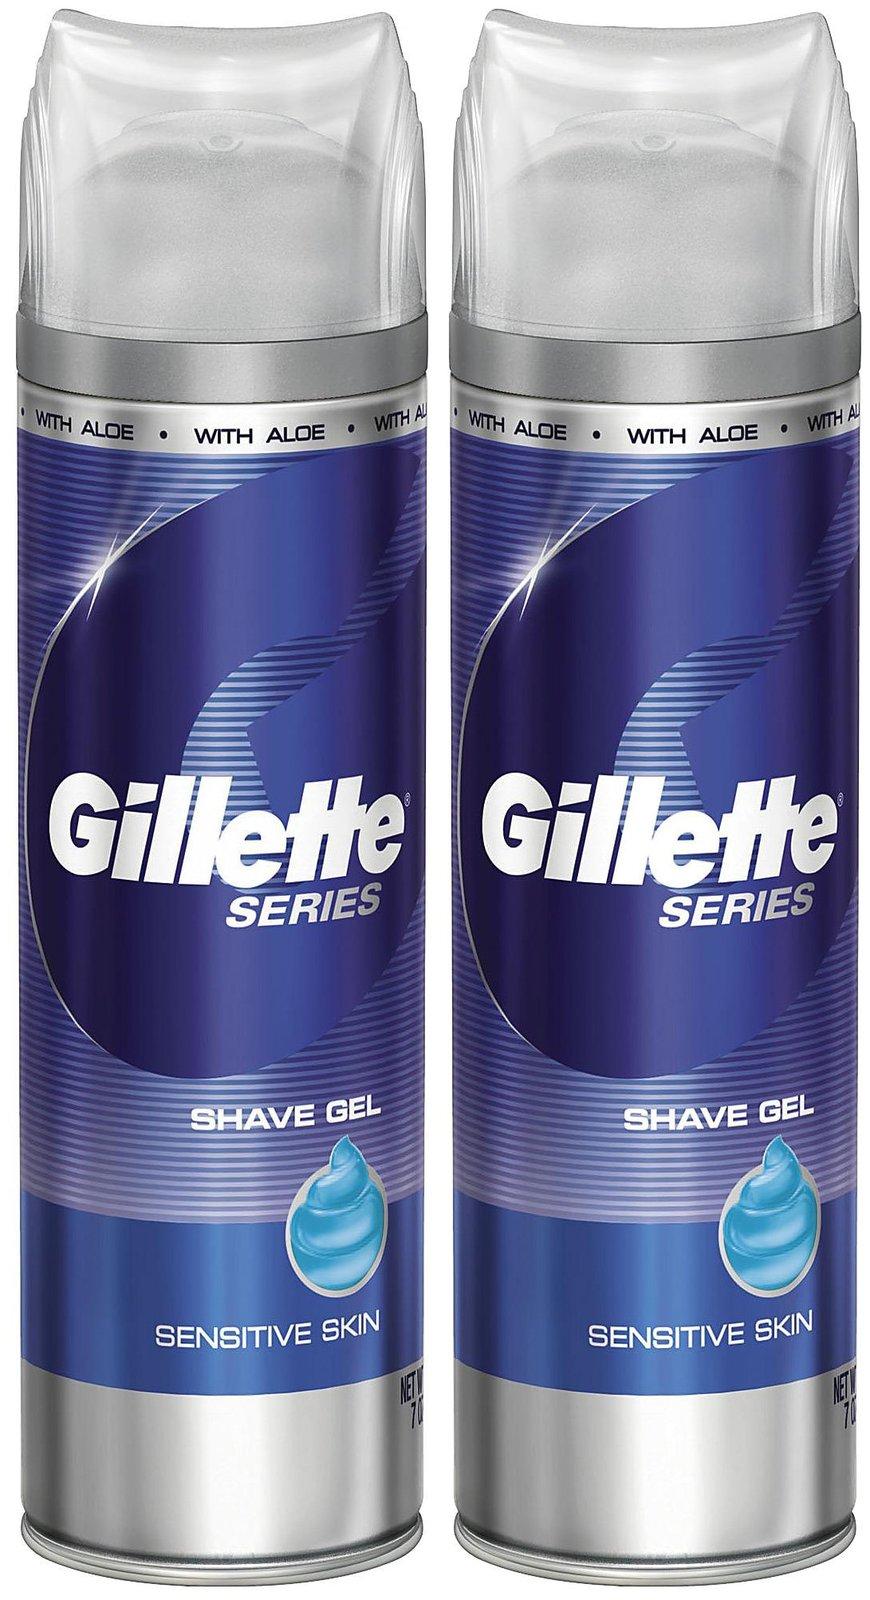 Gillette shaving cream coupons